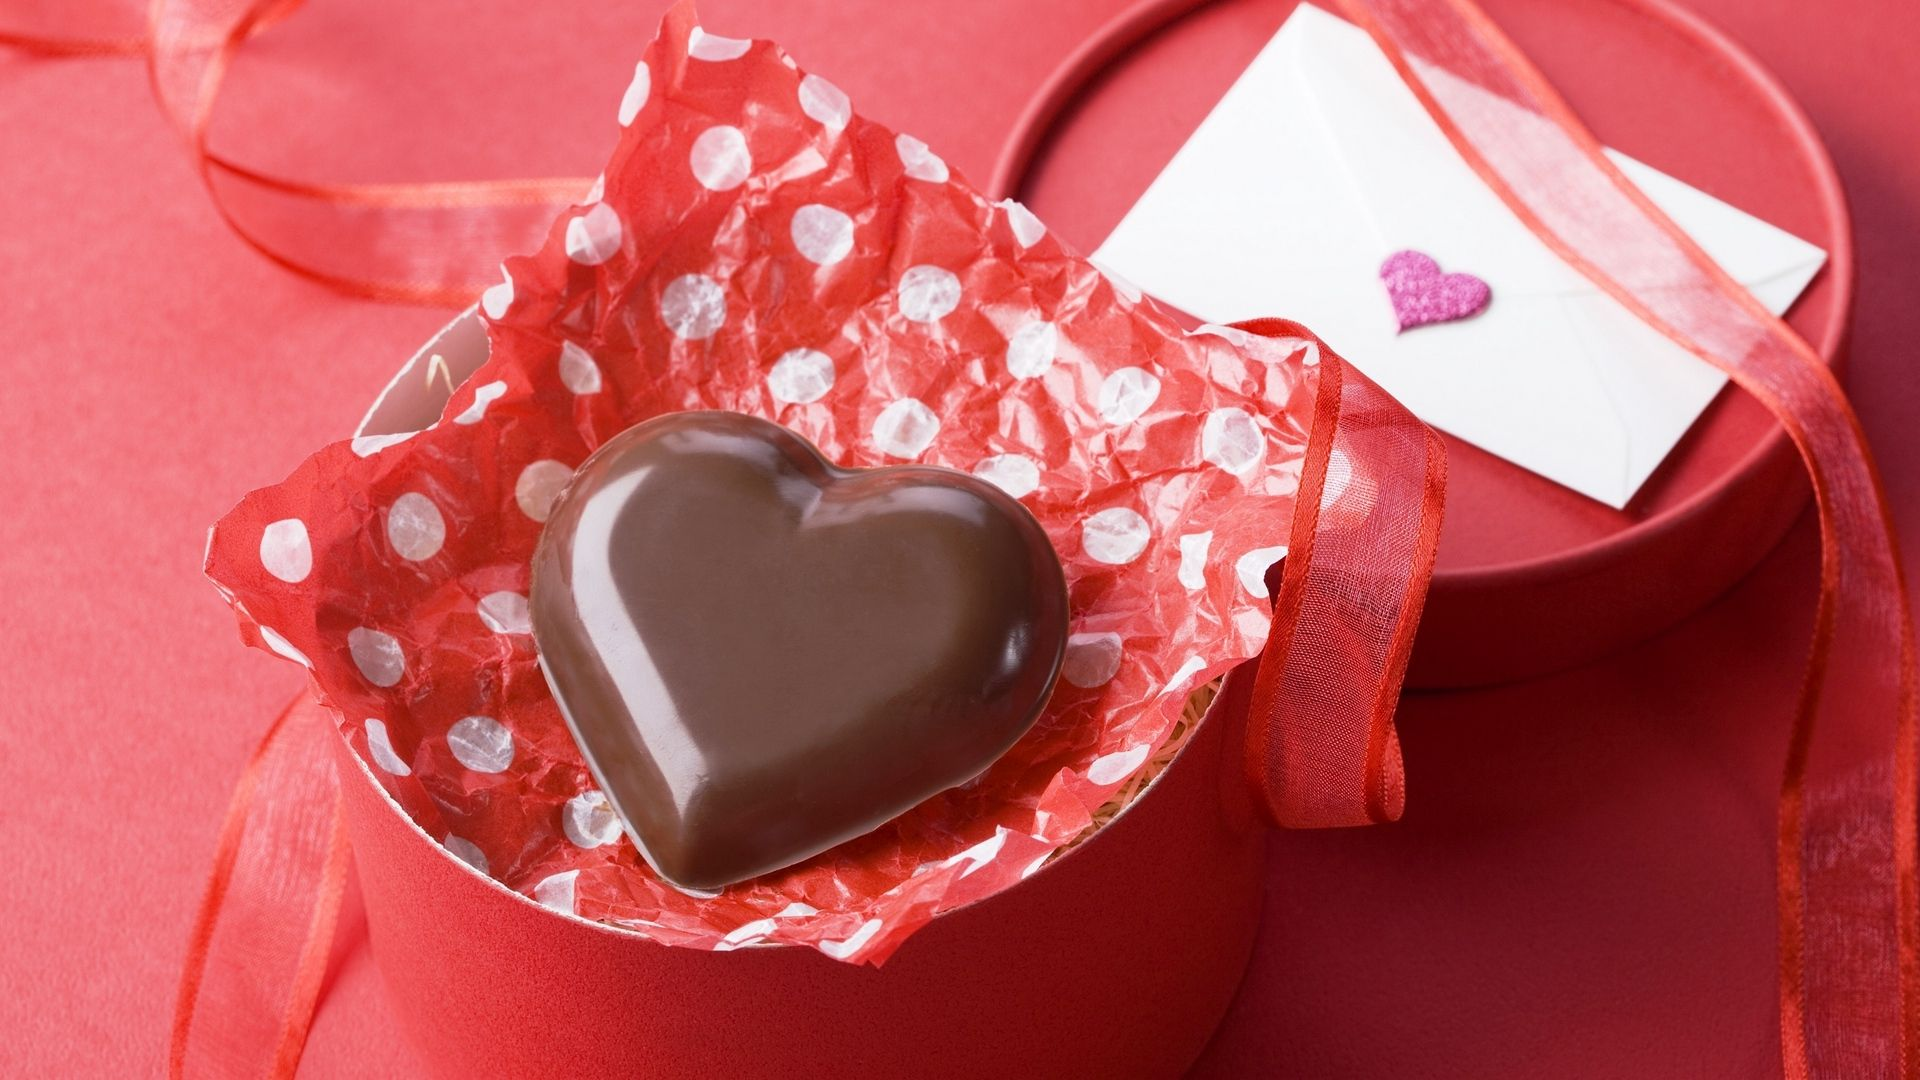 Gift Heart Chocolate With Red Background Theme Shokolad Podarki Korobochki Happy chocolate day images 2021 dairy